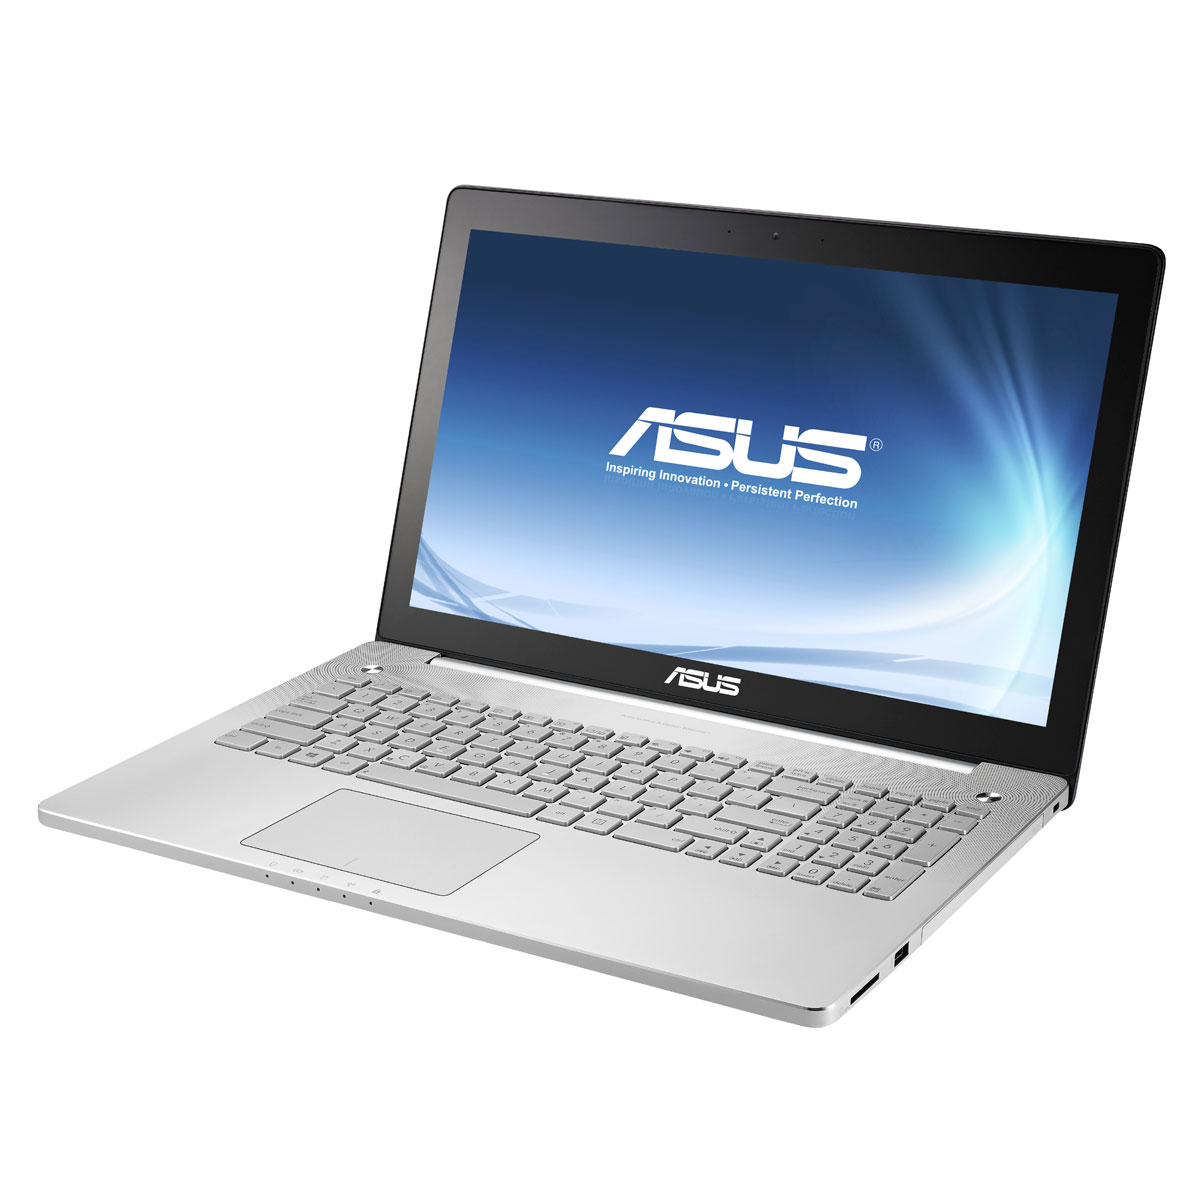 "PC portable ASUS N550JV-CN036H Intel Core i7-4700HQ 8 Go 750 Go 15.6"" LED NVIDIA GeForce GT 750M Lecteur Blu-ray/Graveur DVD Wi-Fi N/Bluetooth Webcam Windows 8 64 bits (garantie constructeur 1 an)"